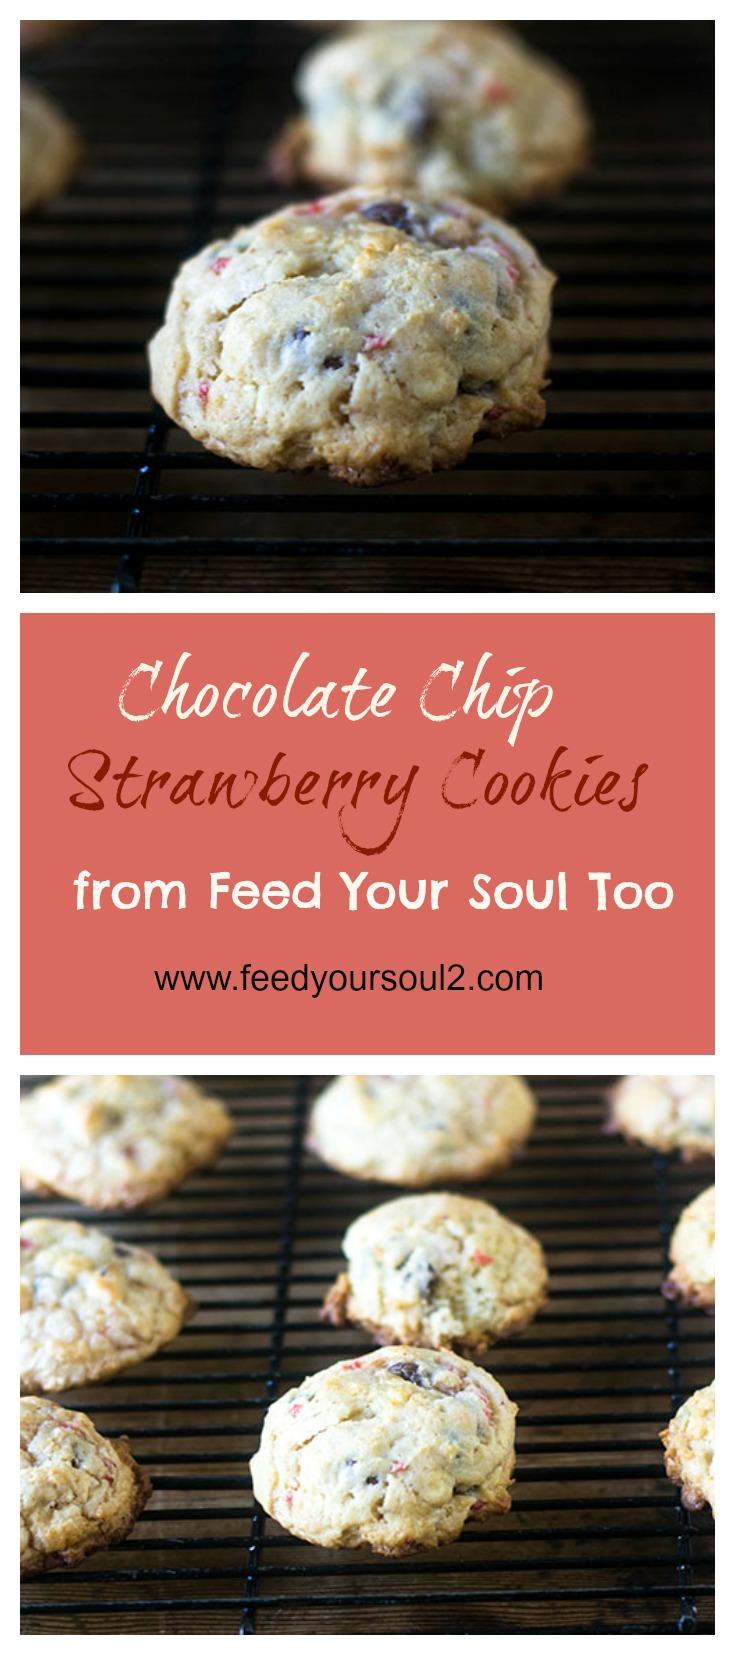 Chocolate Chip Strawberry Cookies #Dessert #cookies #chocolate #strawberry | feedyoursoul2.com